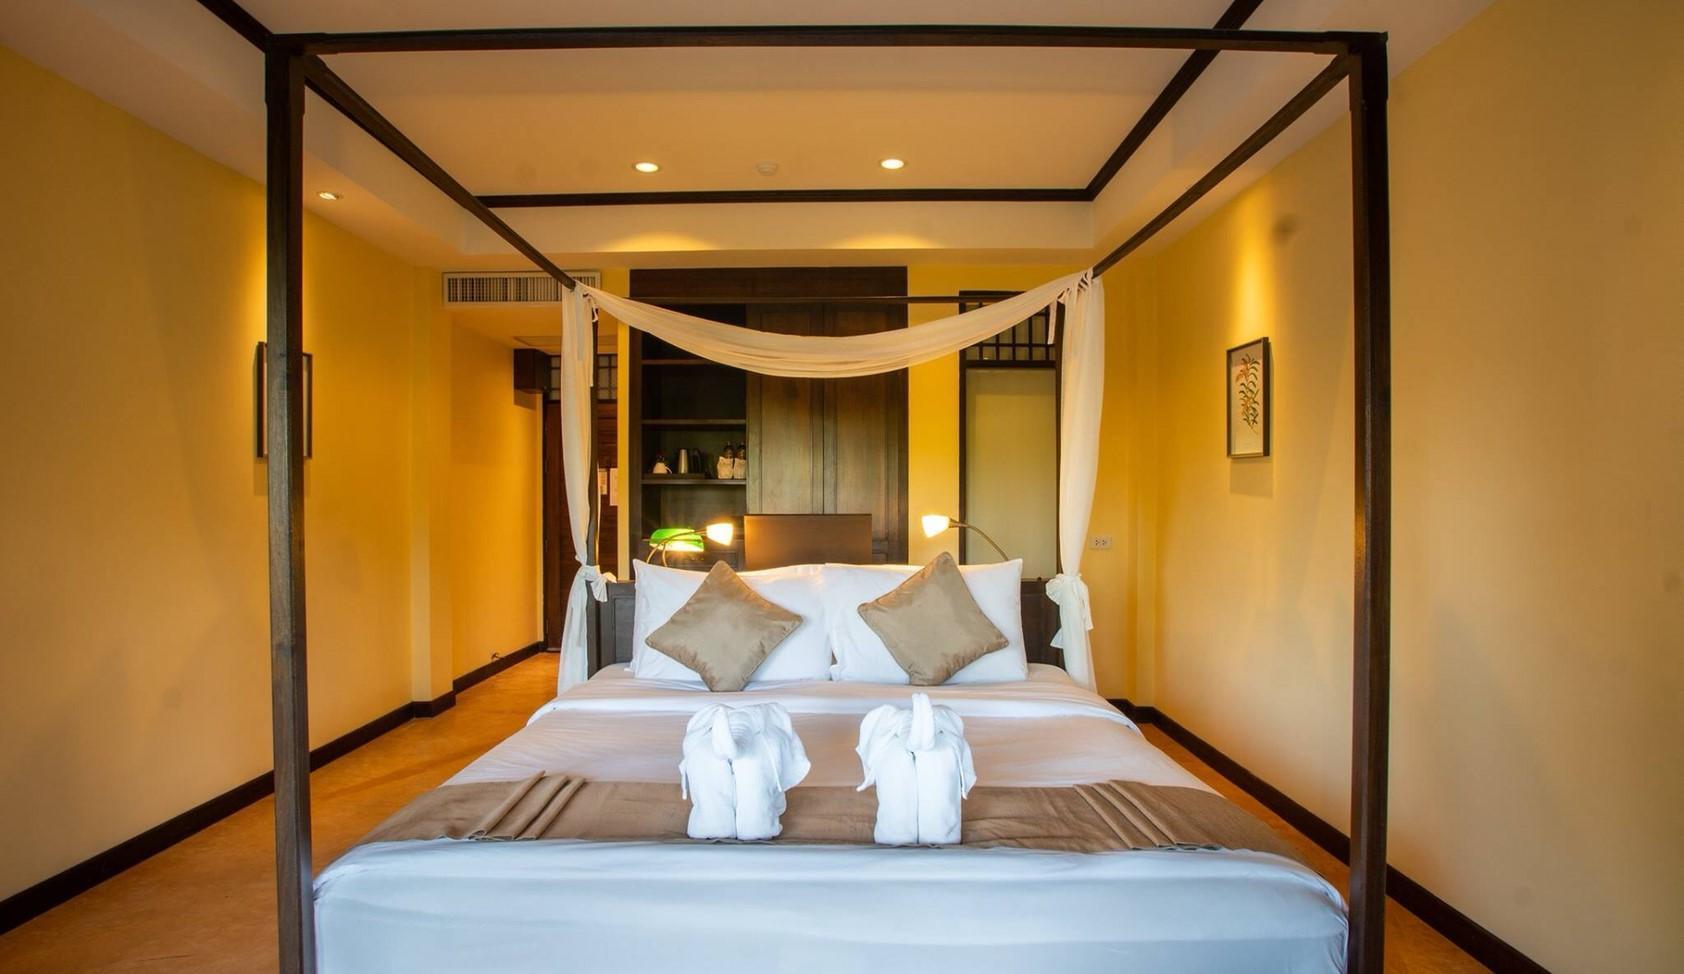 Lanna Country Resort 25BR w/ Pool & Breakfast วิลลา 21 ห้องนอน 21 ห้องน้ำส่วนตัว ขนาด 3324 ตร.ม. – สุเทพ